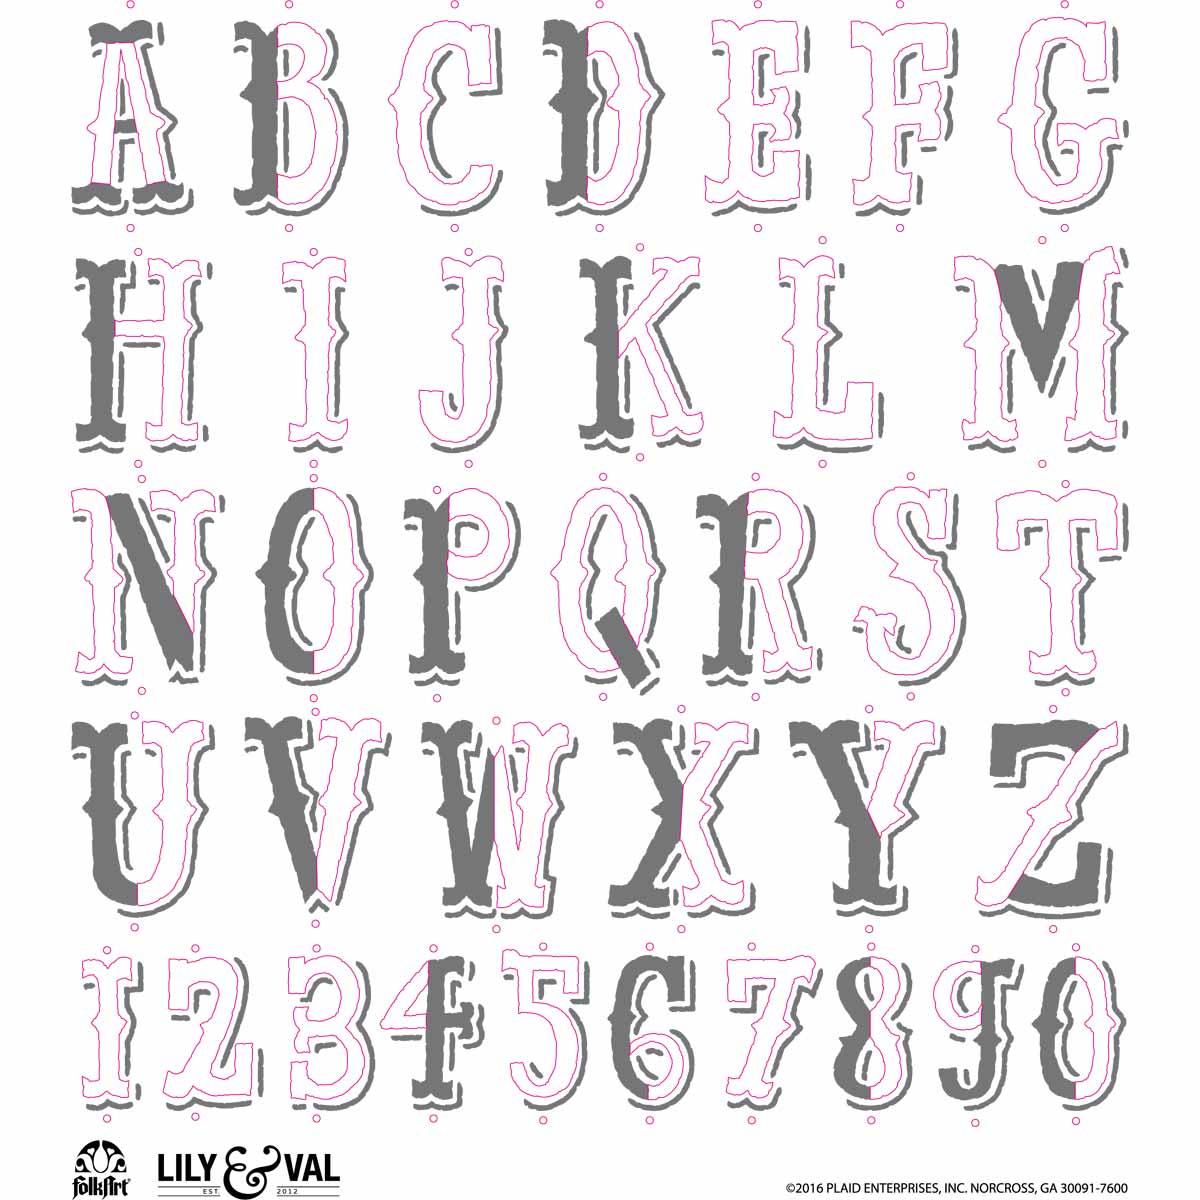 FolkArt ® Lily & Val™ Stencils - Variety Packs - Market Fresh - 13252